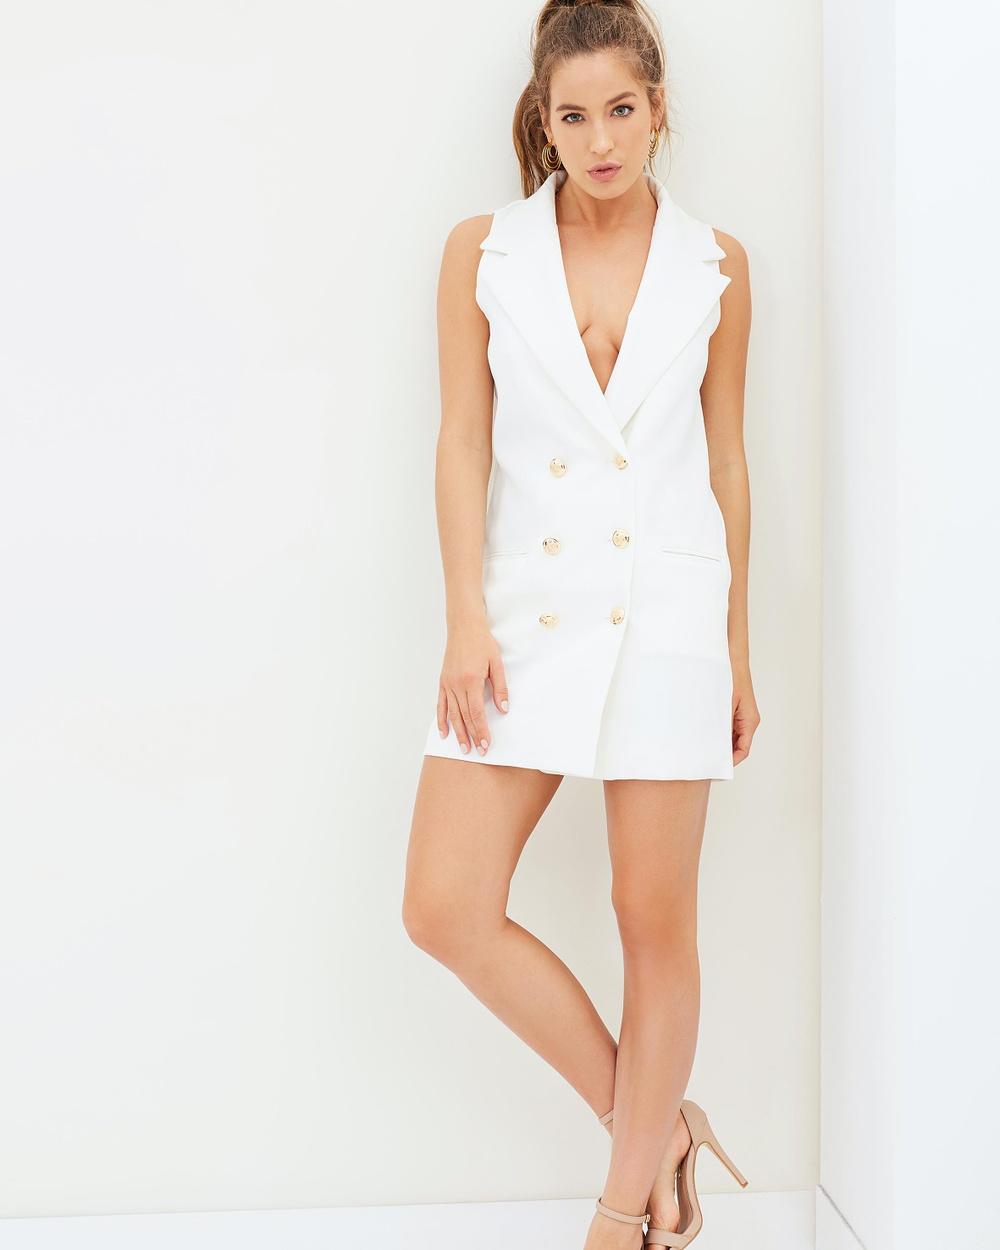 Missguided Tuxedo Wrap Dress Dresses White Tuxedo Wrap Dress